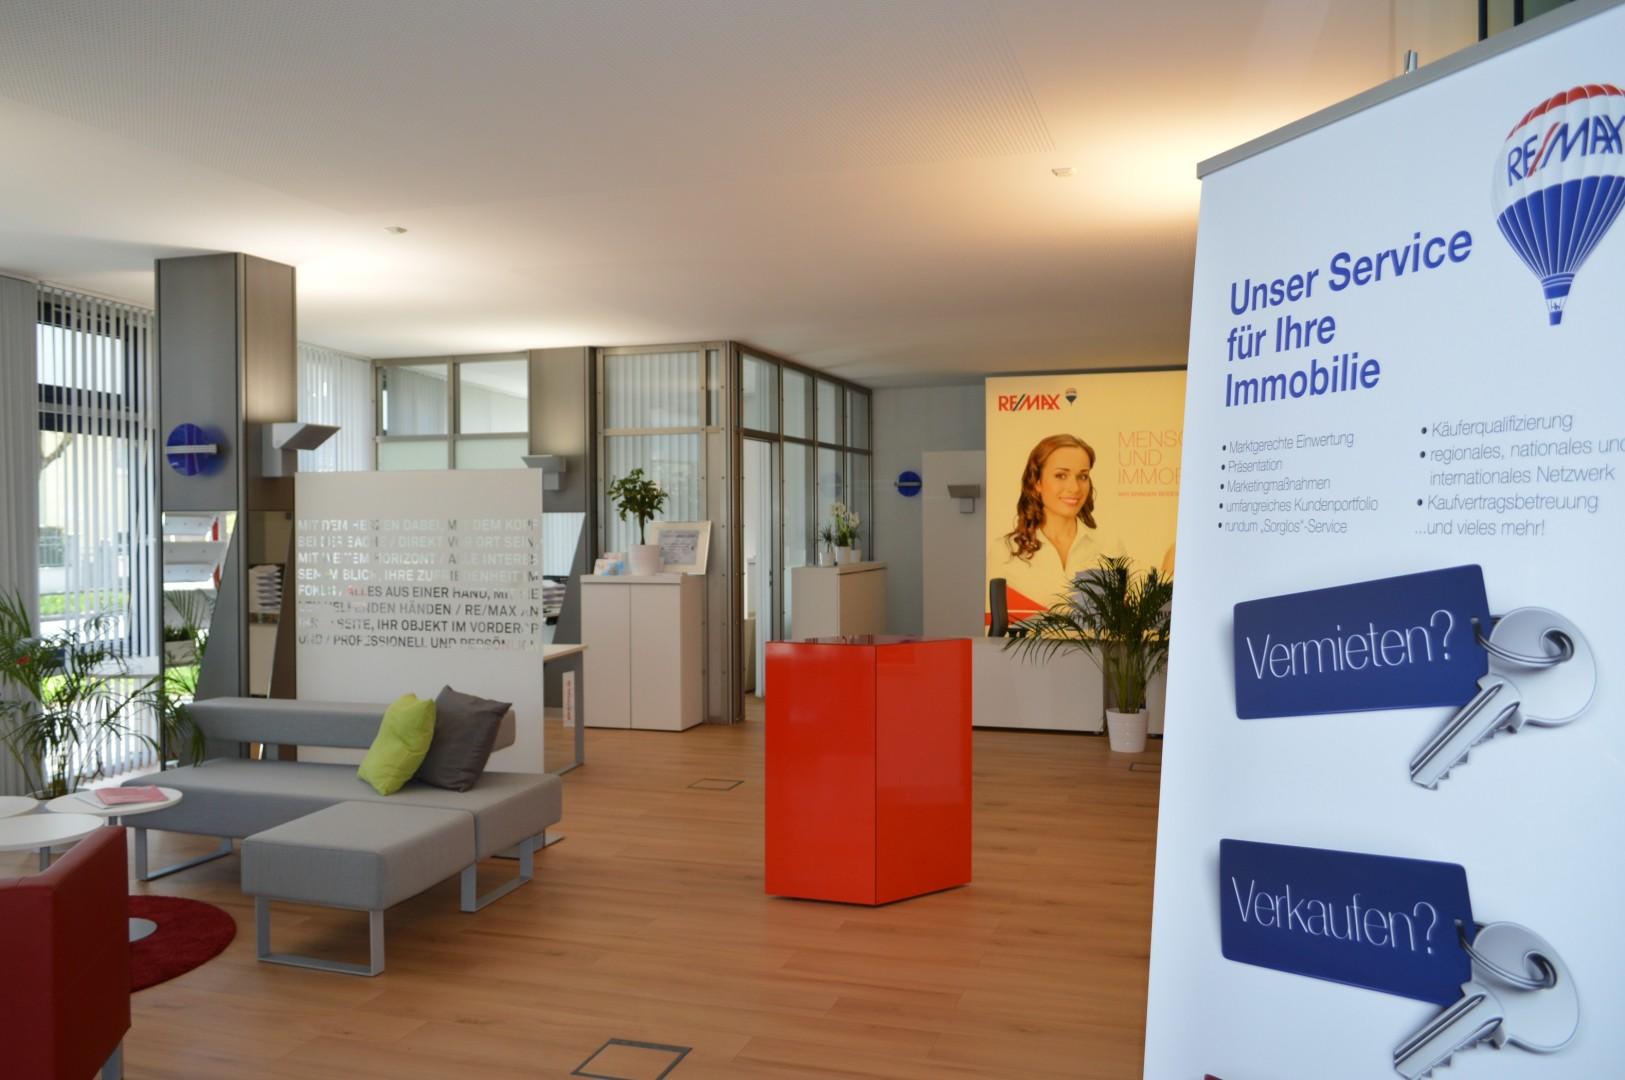 Büro REMAX Augsburg